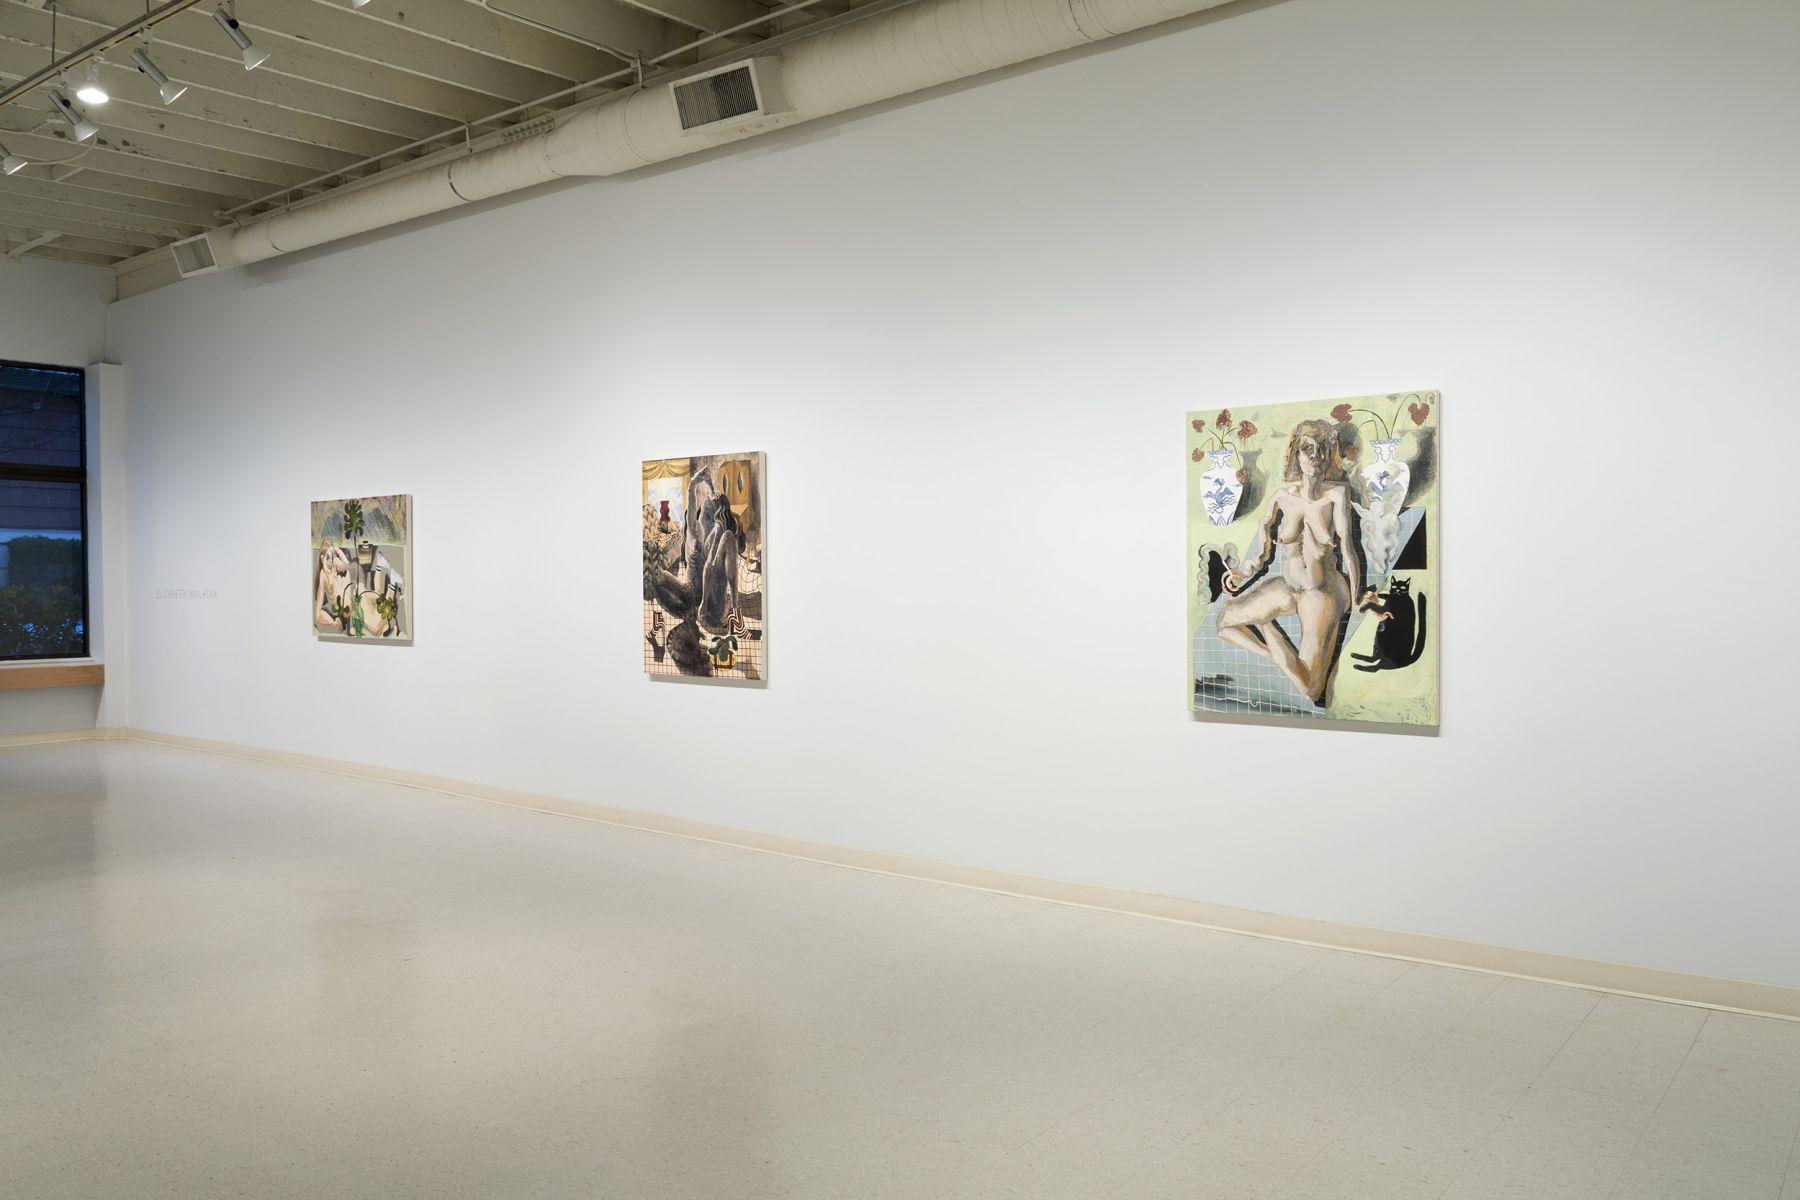 Elizabeth Malaska | Heavenly Bodies | Installation View 1